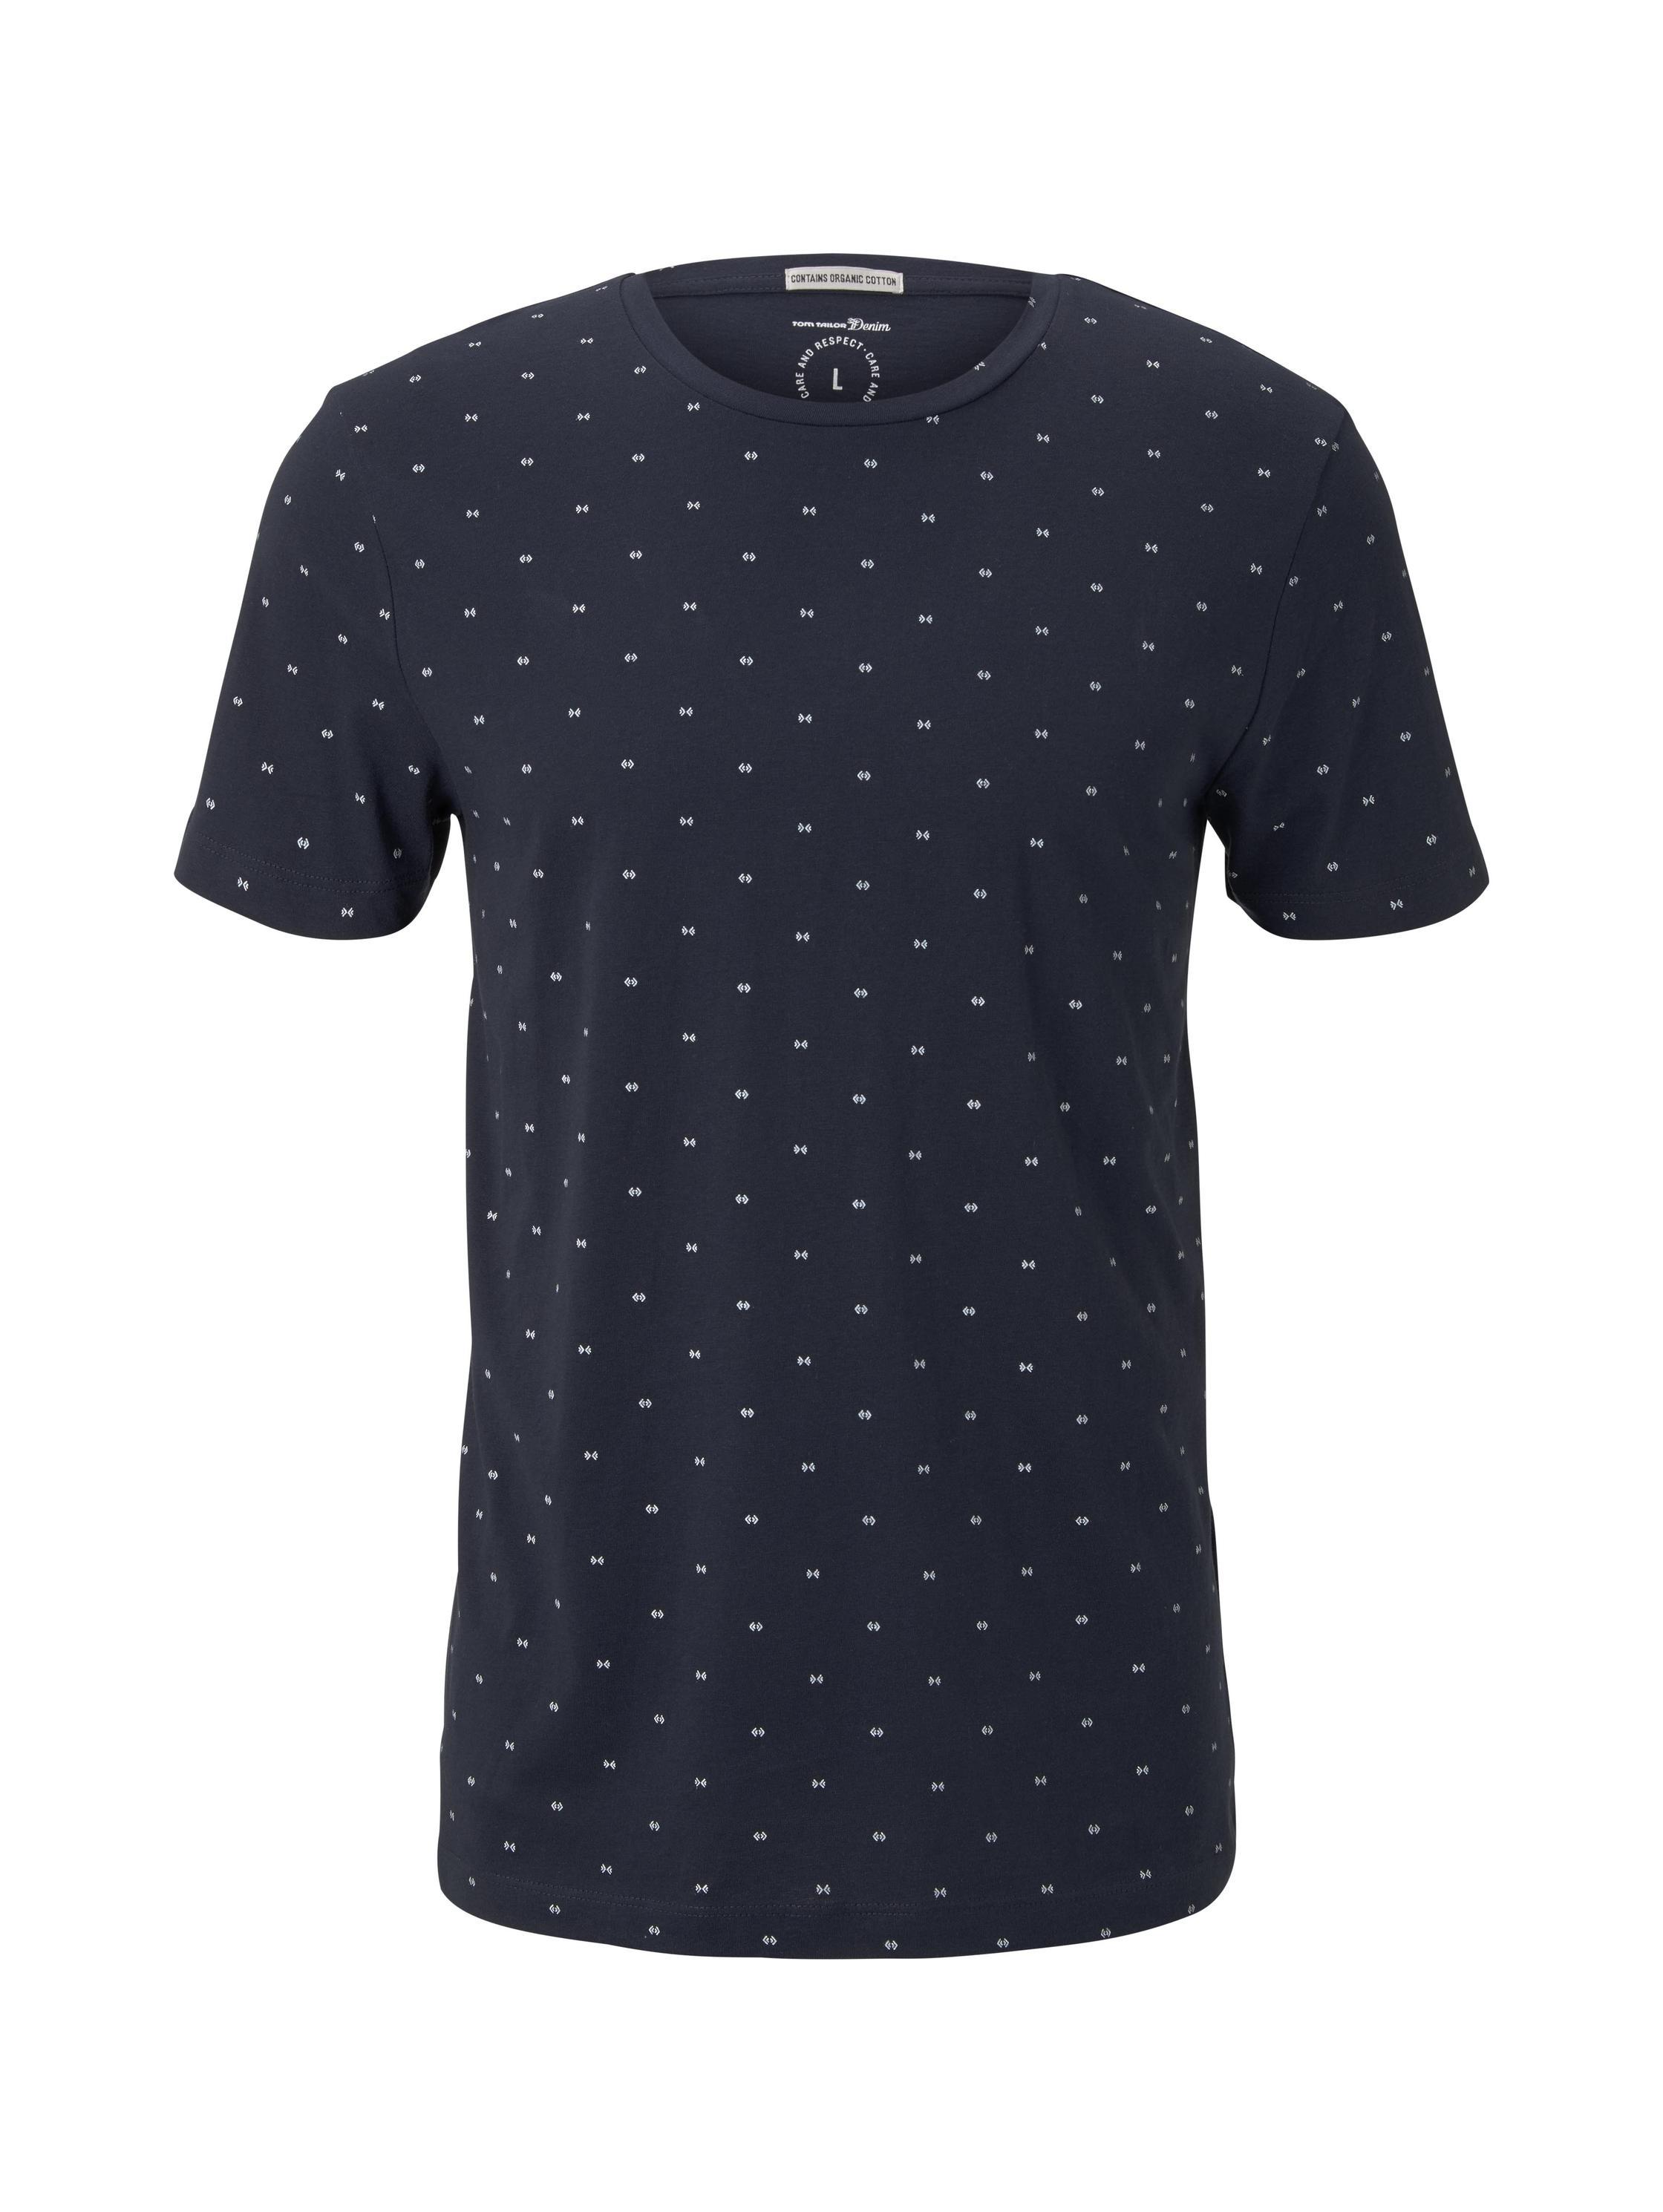 alloverprinted T-shirt, navy small element print